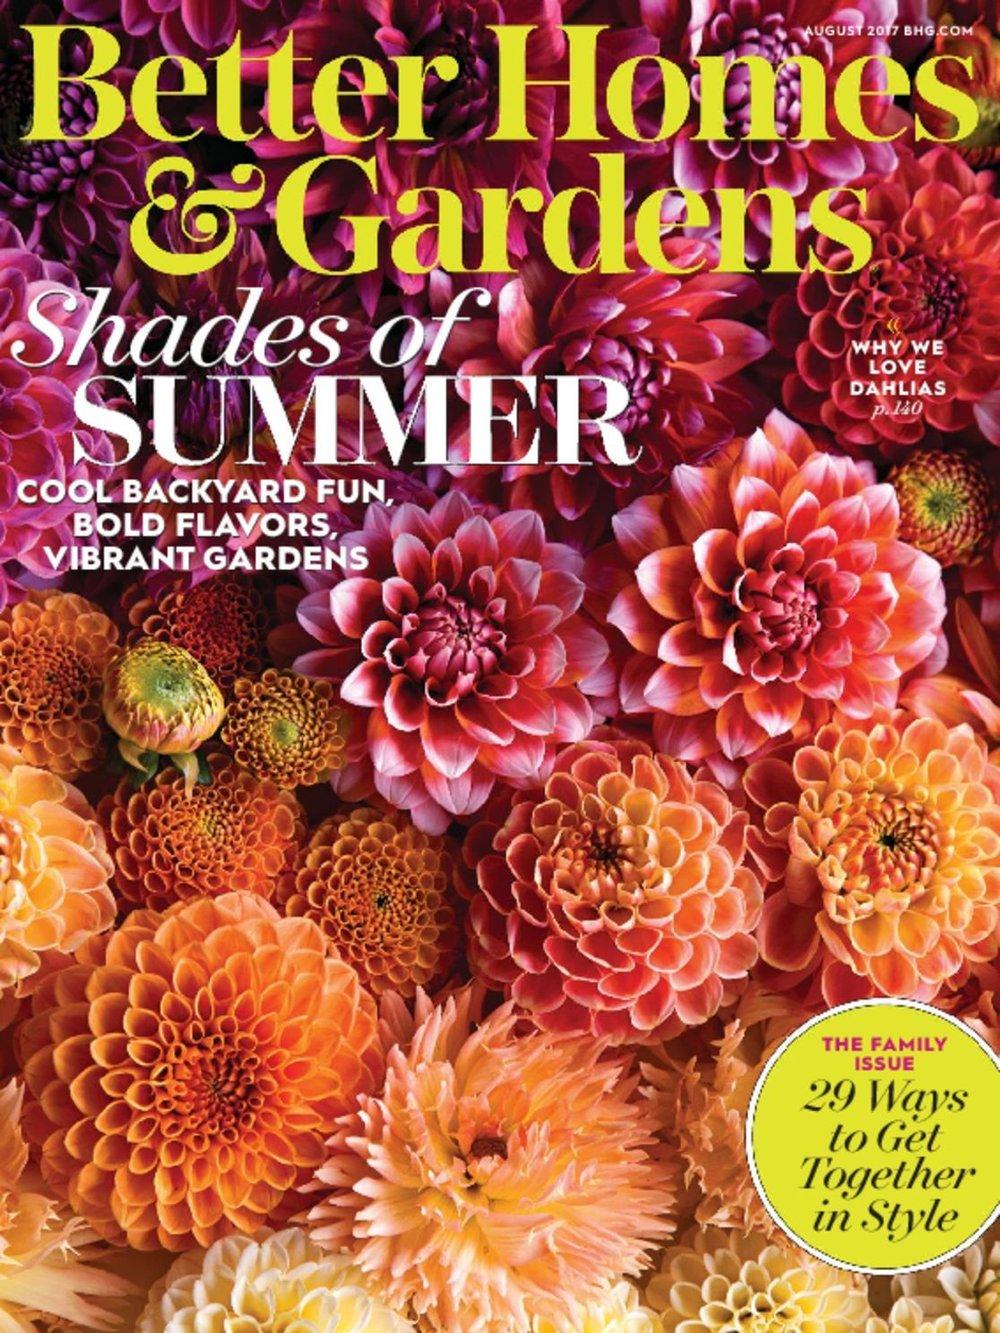 Aug 2017 Better Homes and Gardens Cover.jpg